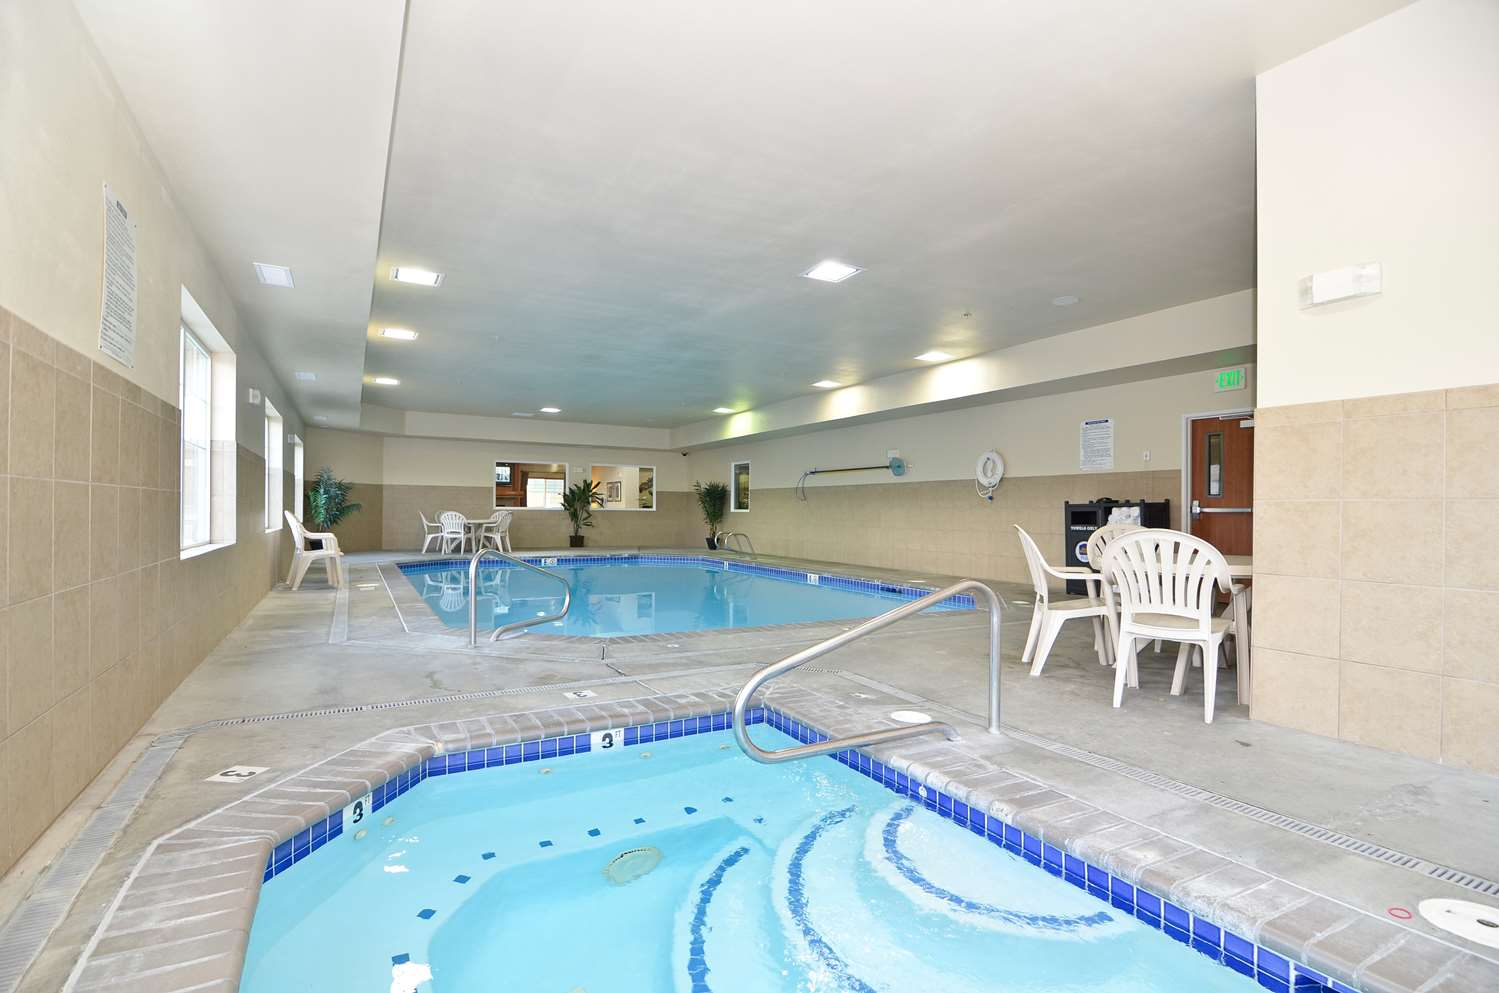 Hotels Motels In Omak Washington